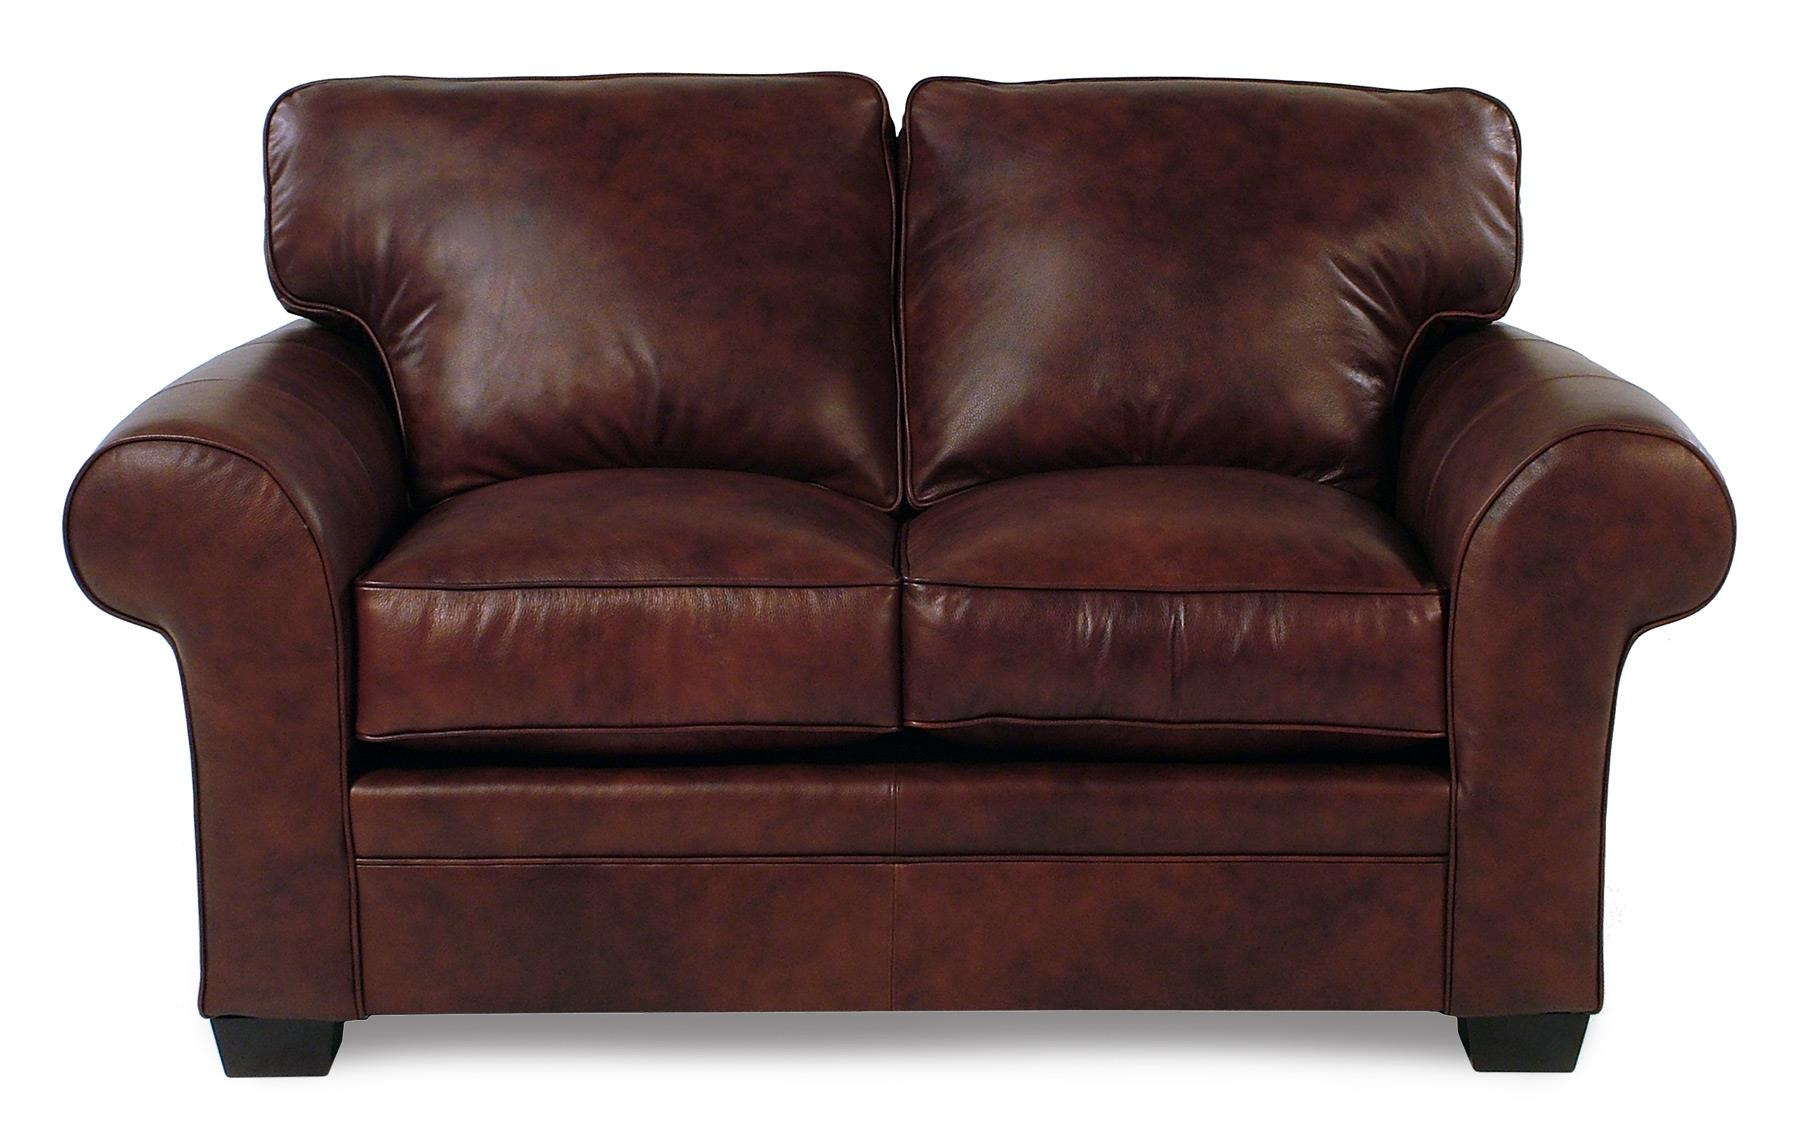 Broyhill Furniture Zephyr Leather Loveseat - Item Number: L7902-1-BARK